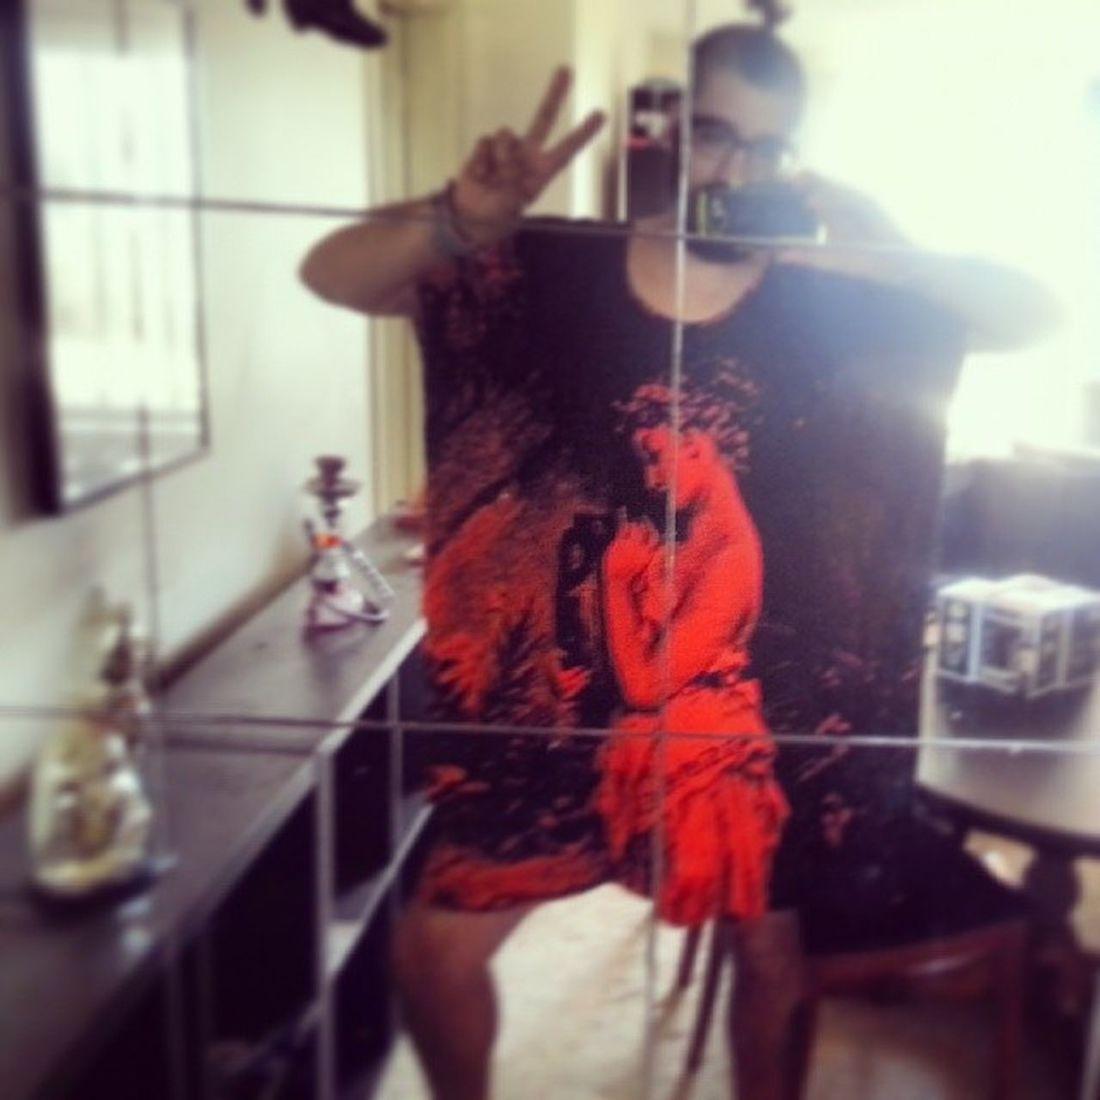 Representing Mumu Realness. Dayoff Mumu Muumuu MOOMOO prisonersofstpetersburg seminyak bali fashun balifashuns getyopinsout pinsout freeballing boxdress orange cameo prettylady mirrorselfie selfie instagay @sarah_berry_ :)